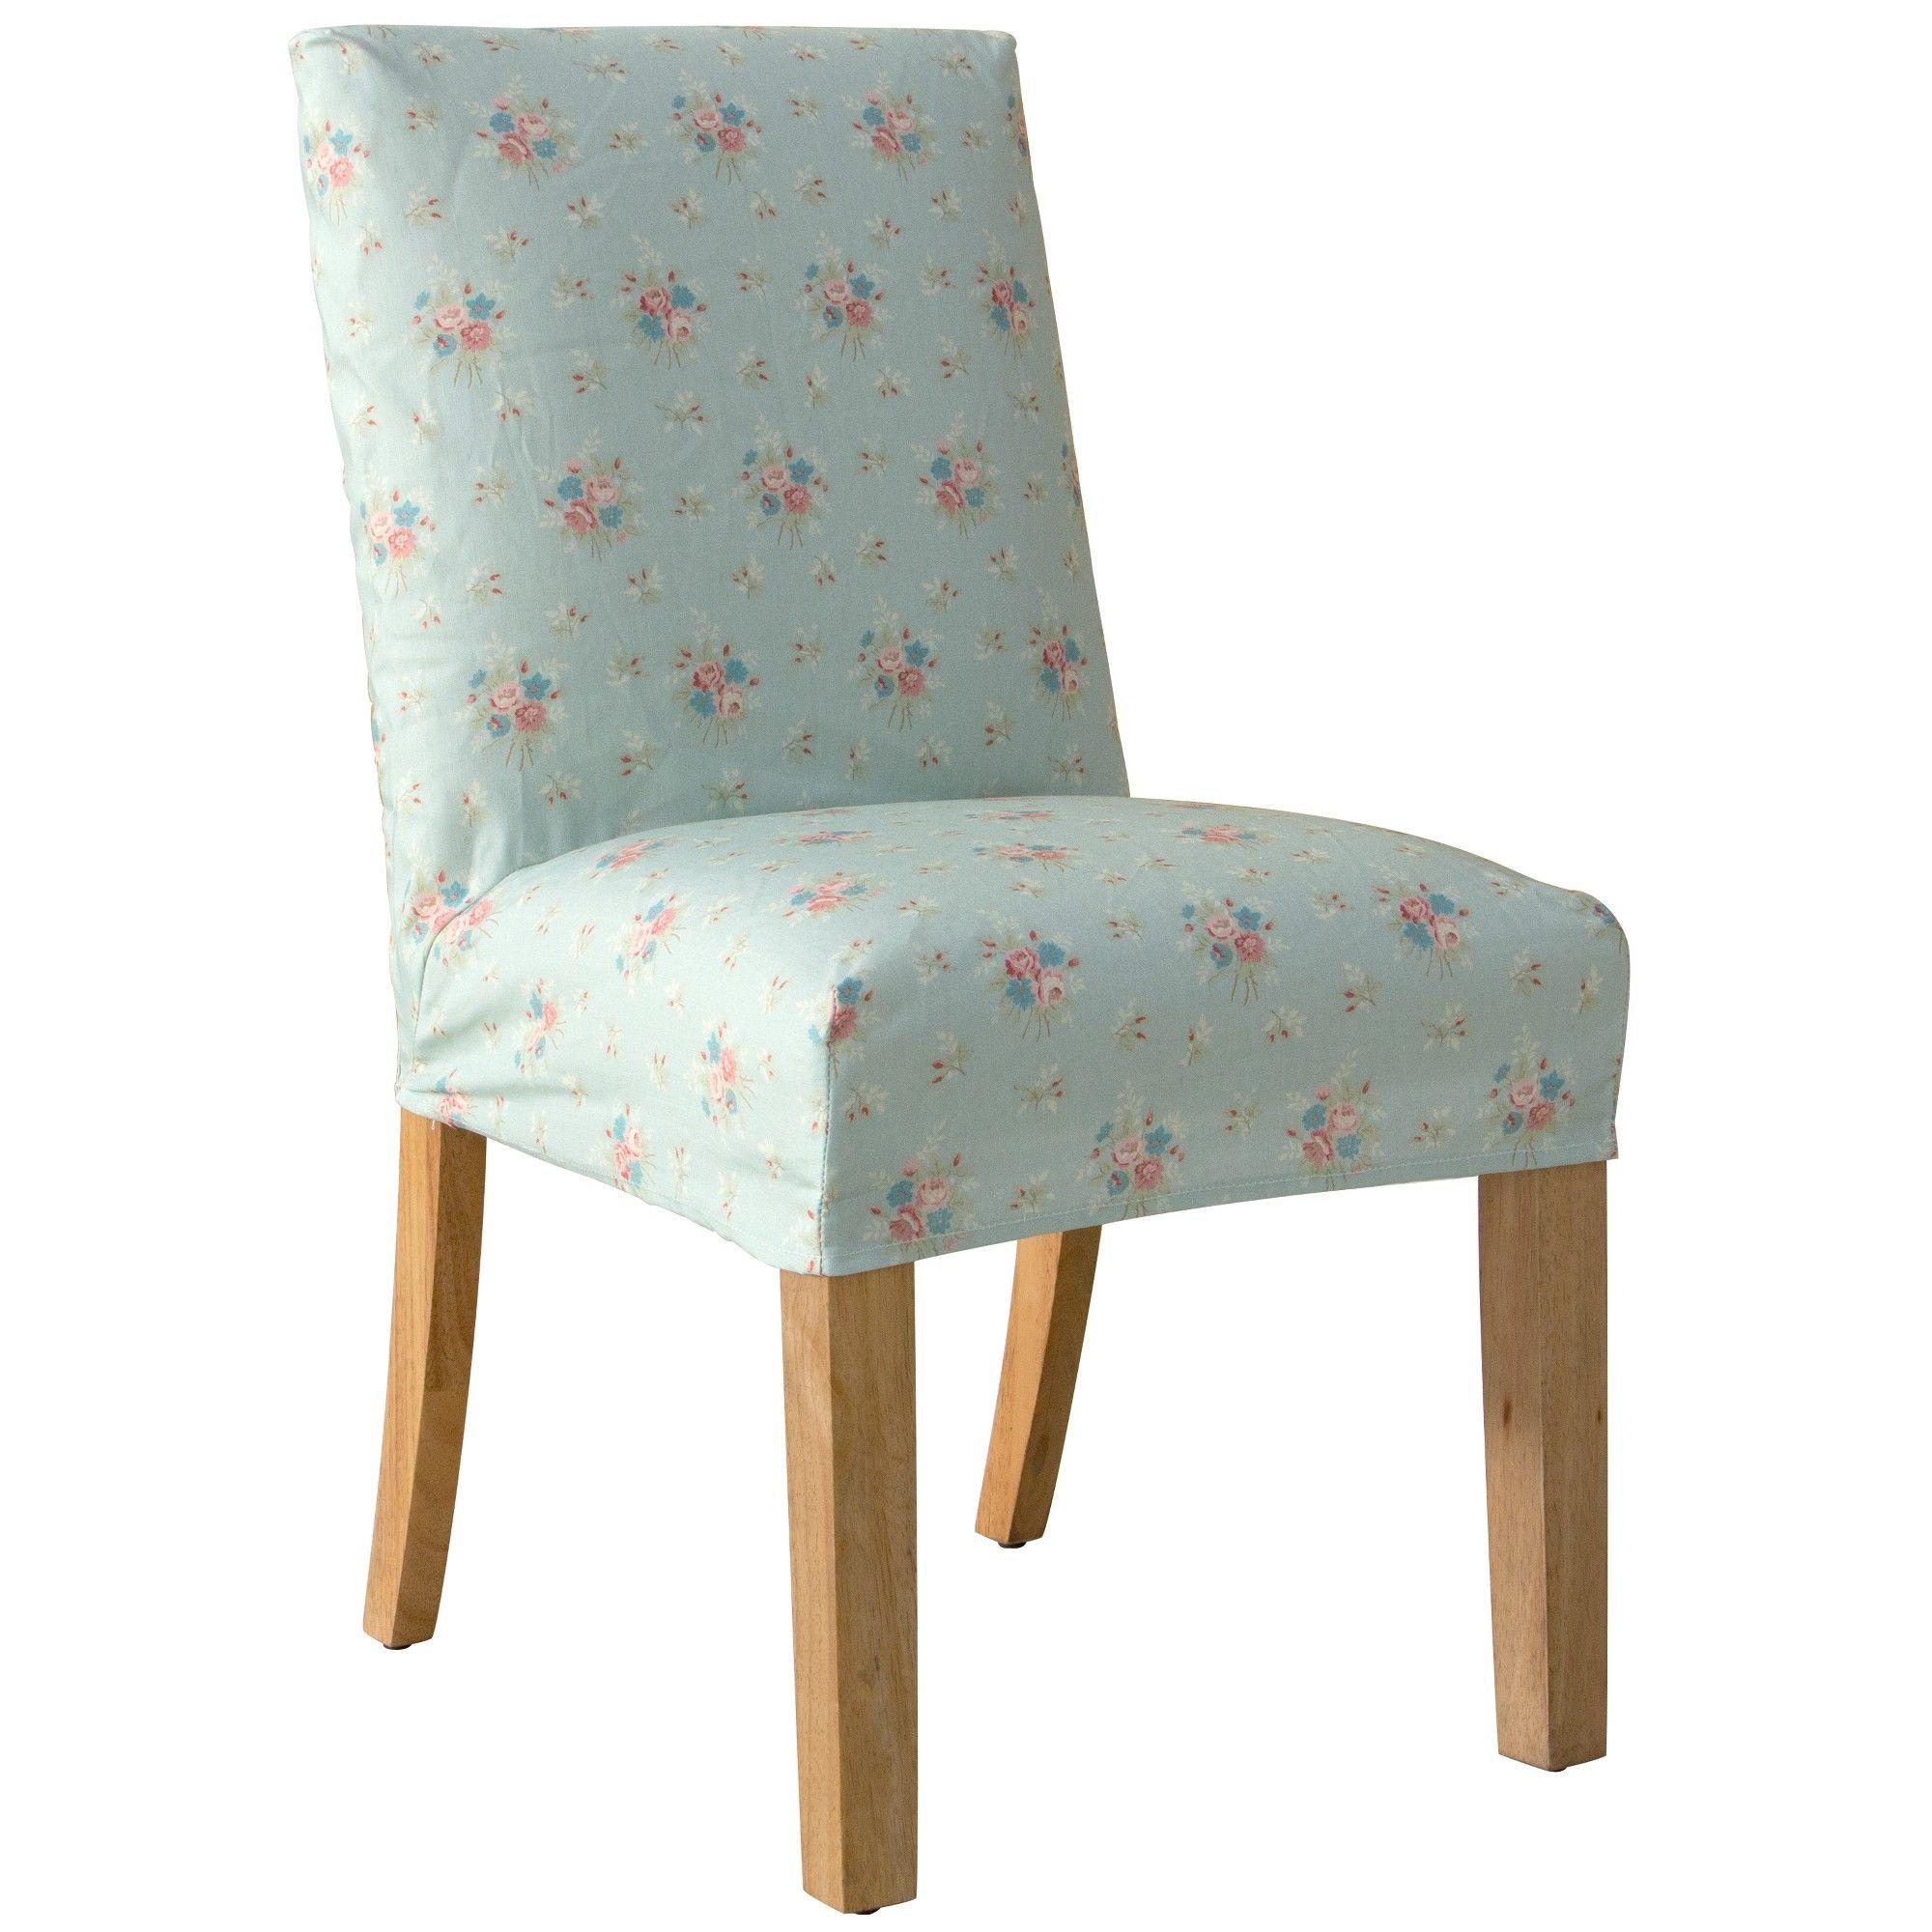 Slipcover Dining Chair Anastasia Blue Simply Shabby Chic